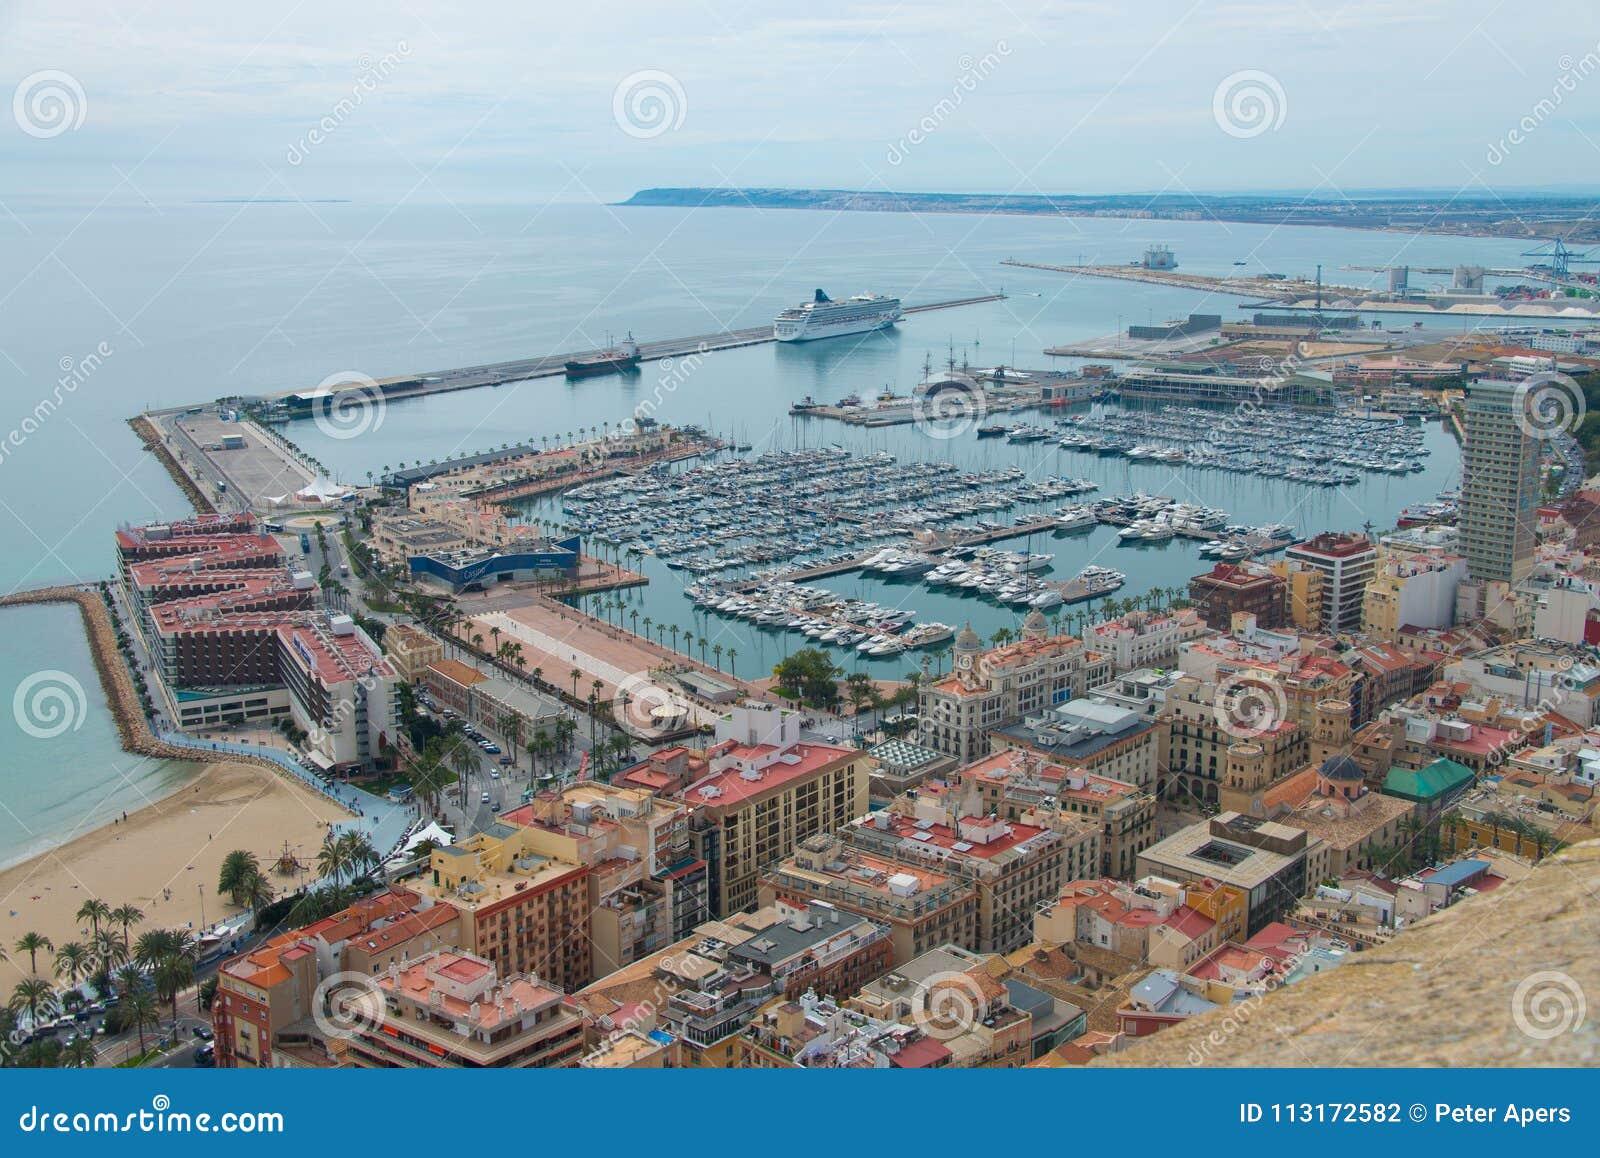 Harbour of Alicante in Spain